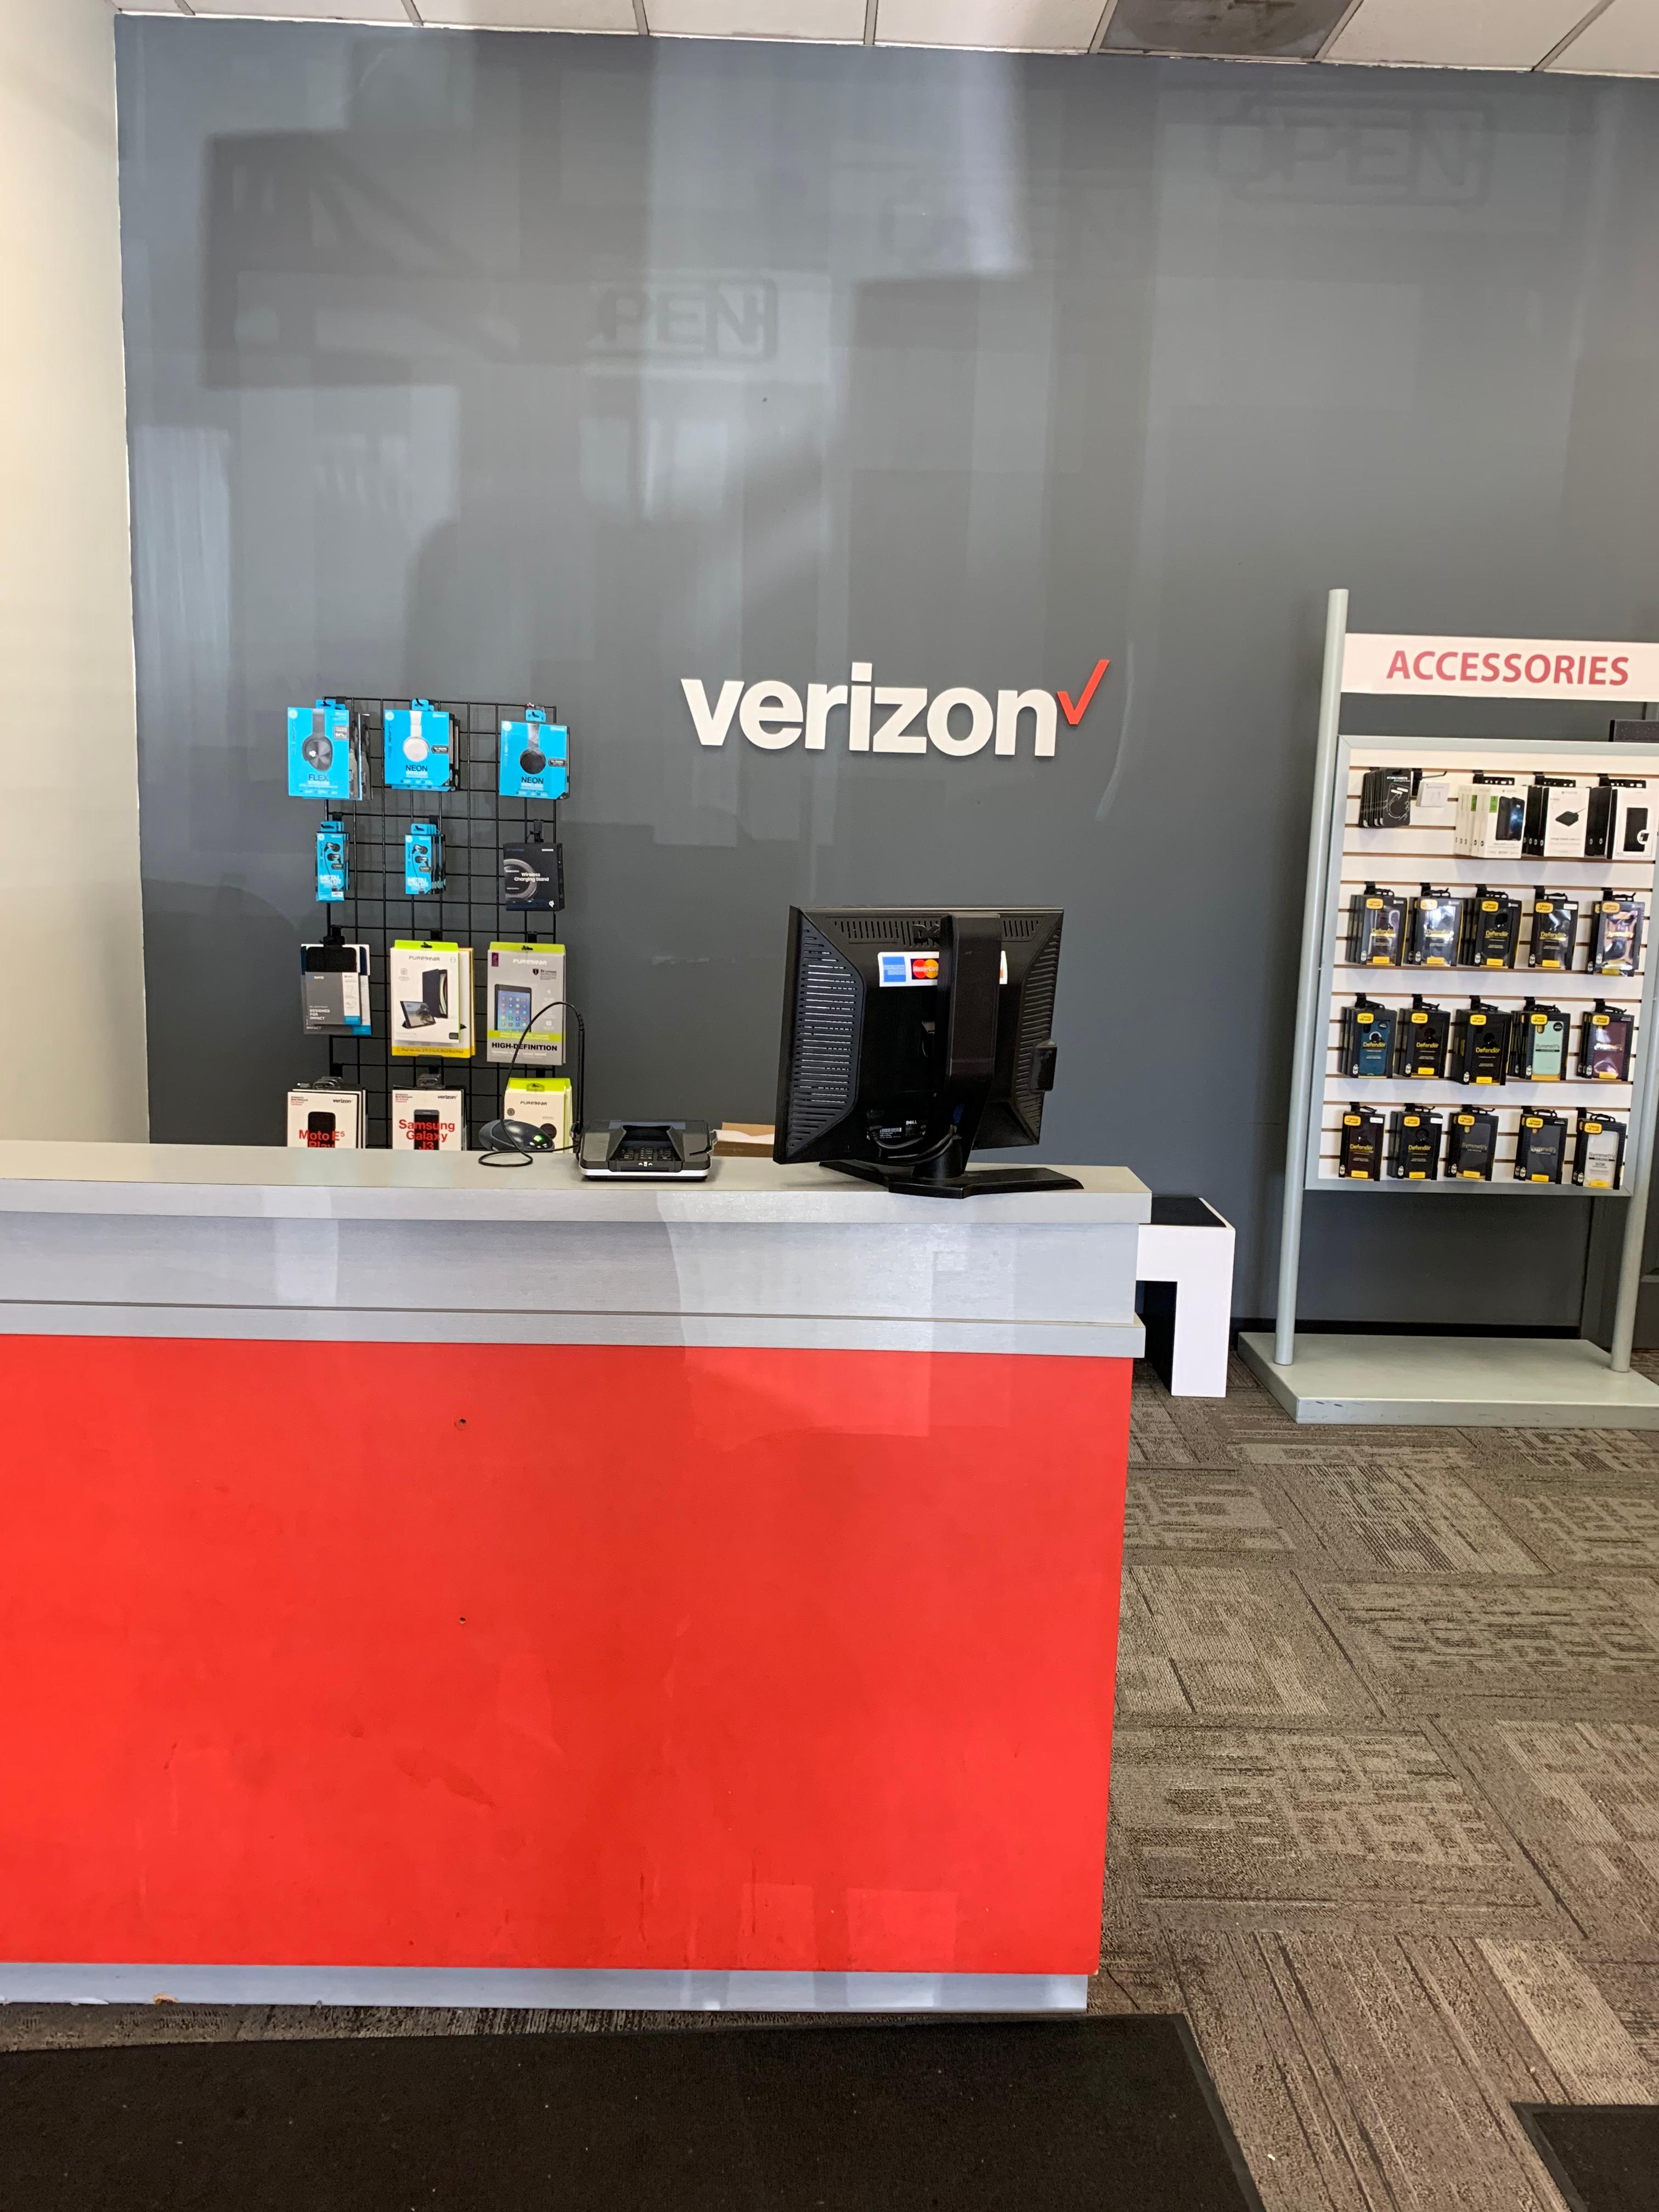 Verizon Authorized Retailer – Victra image 3